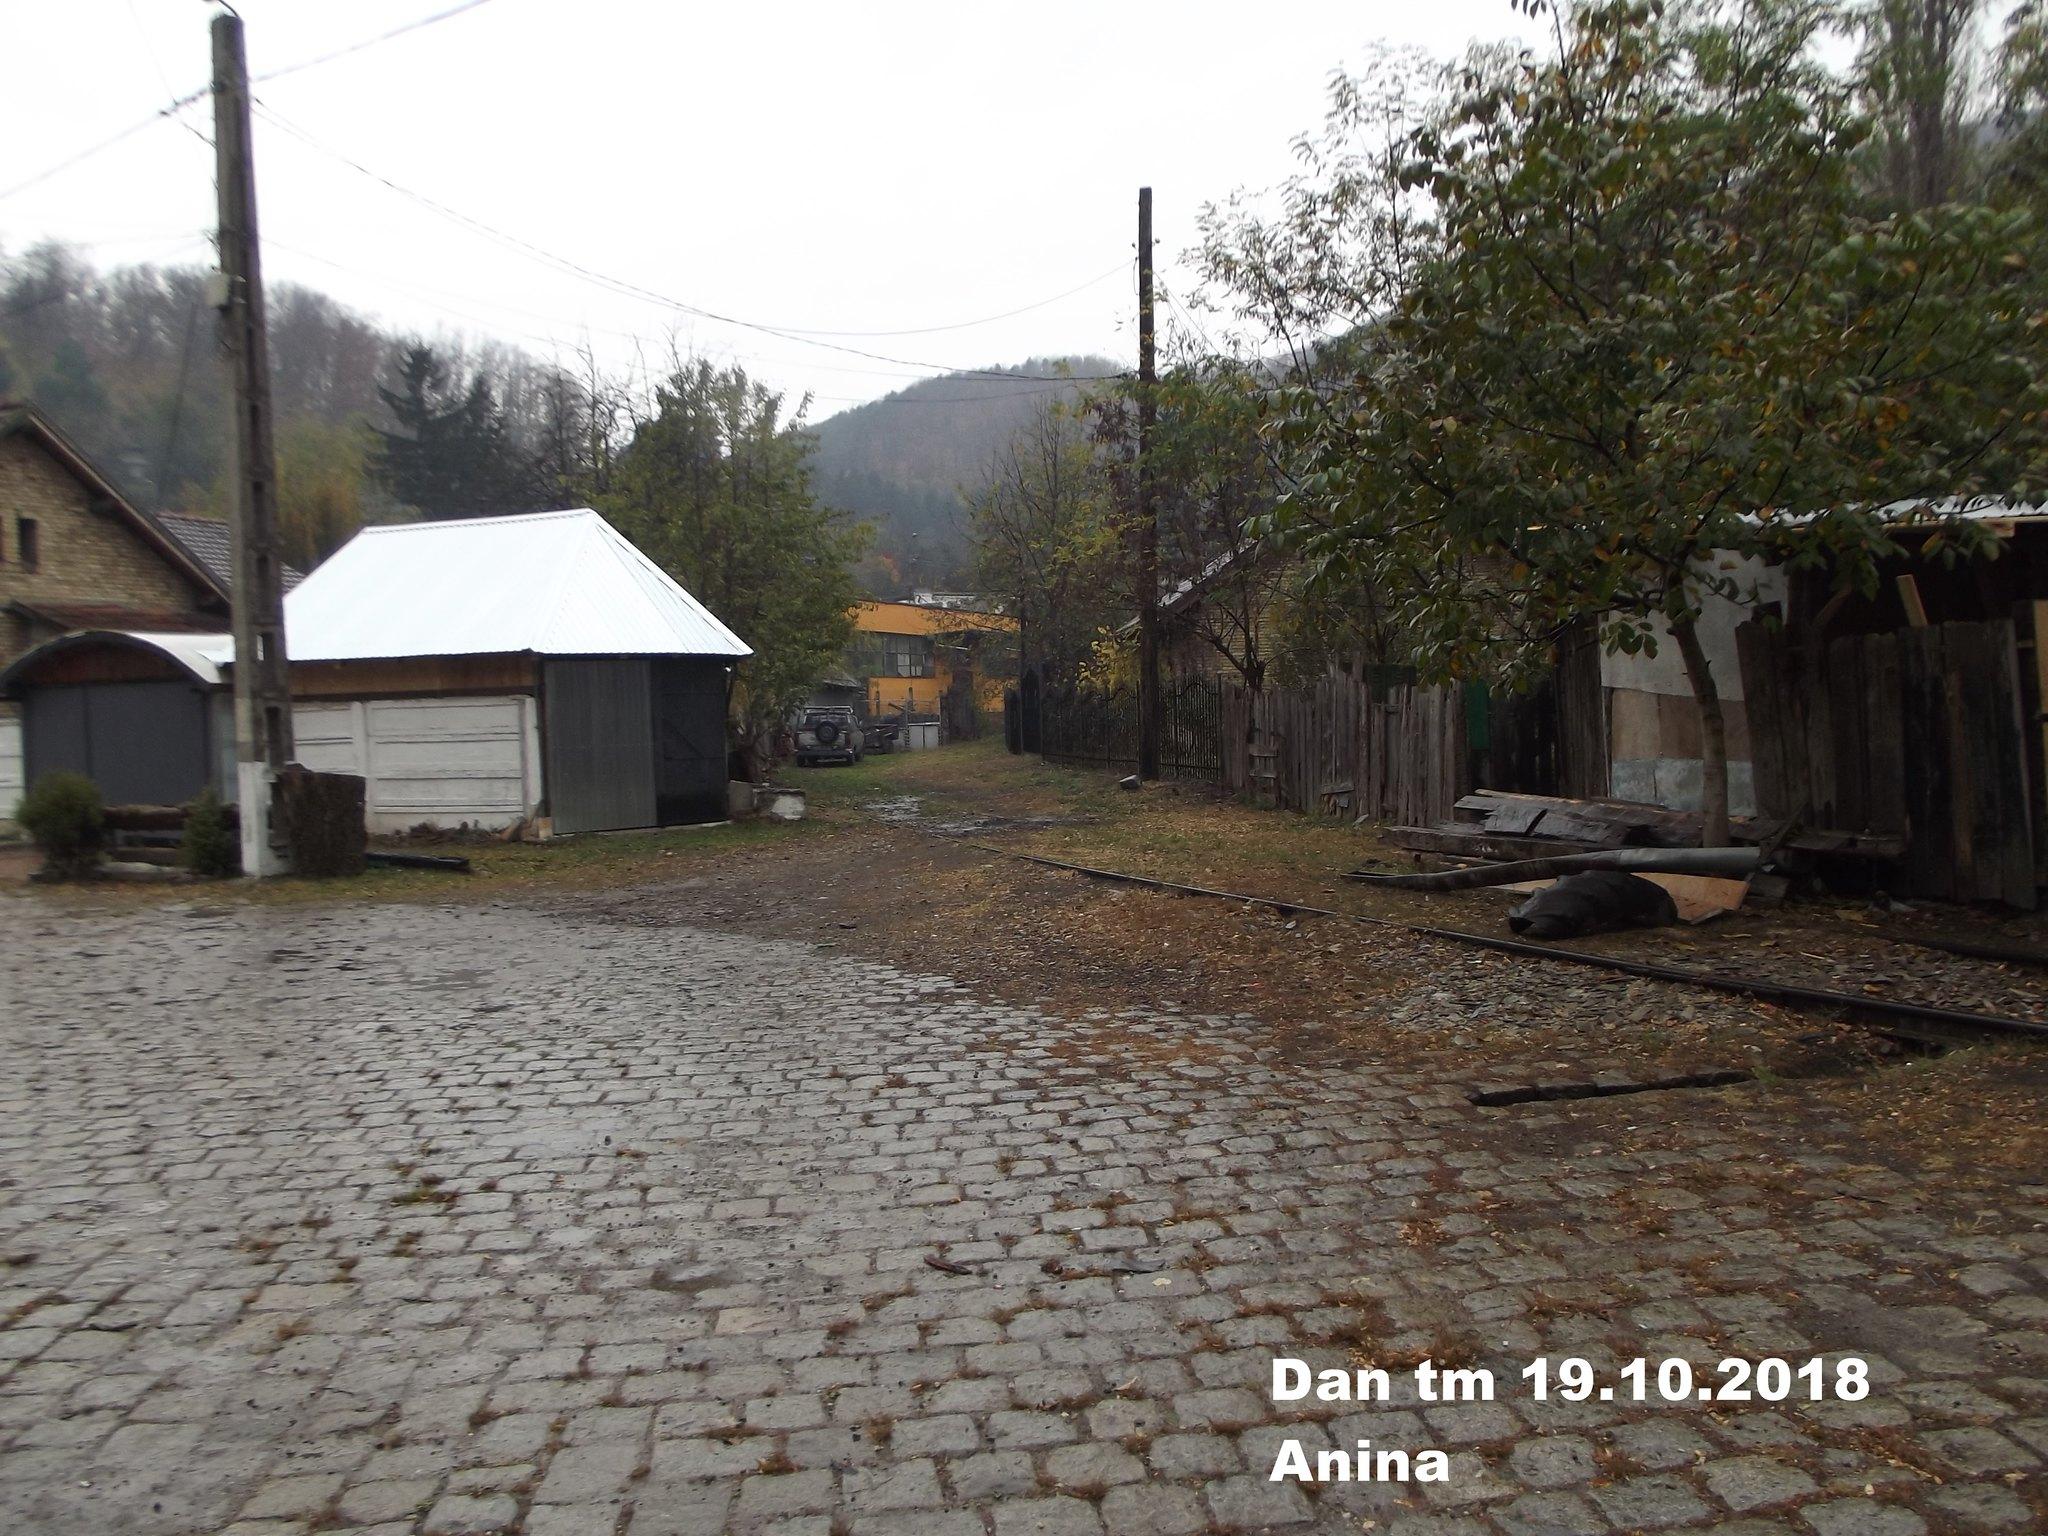 925 : Oravita - Anina - Pagina 40 31596363758_efbd607d39_k